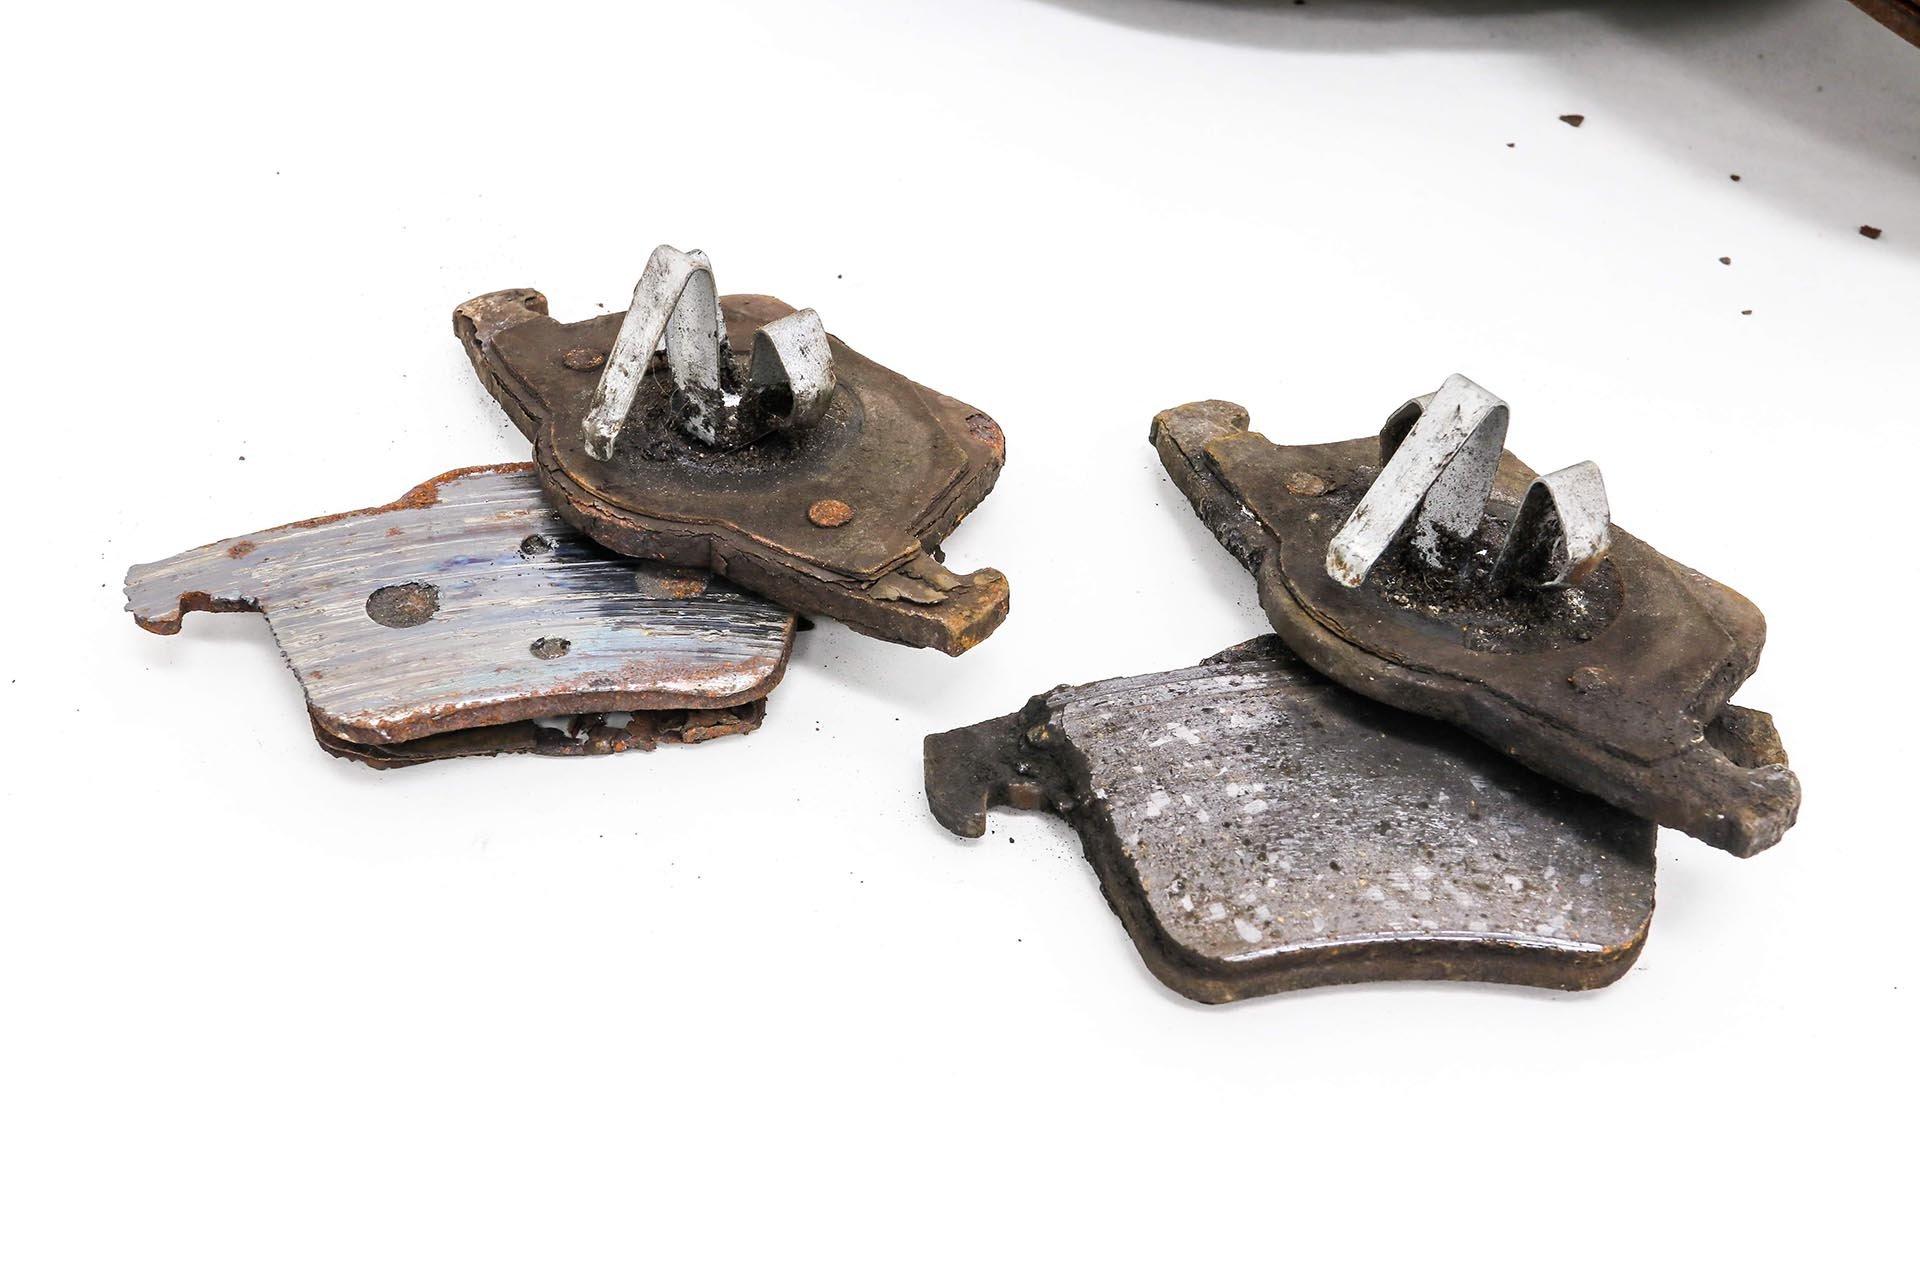 04_Worn brake pads and backing plates